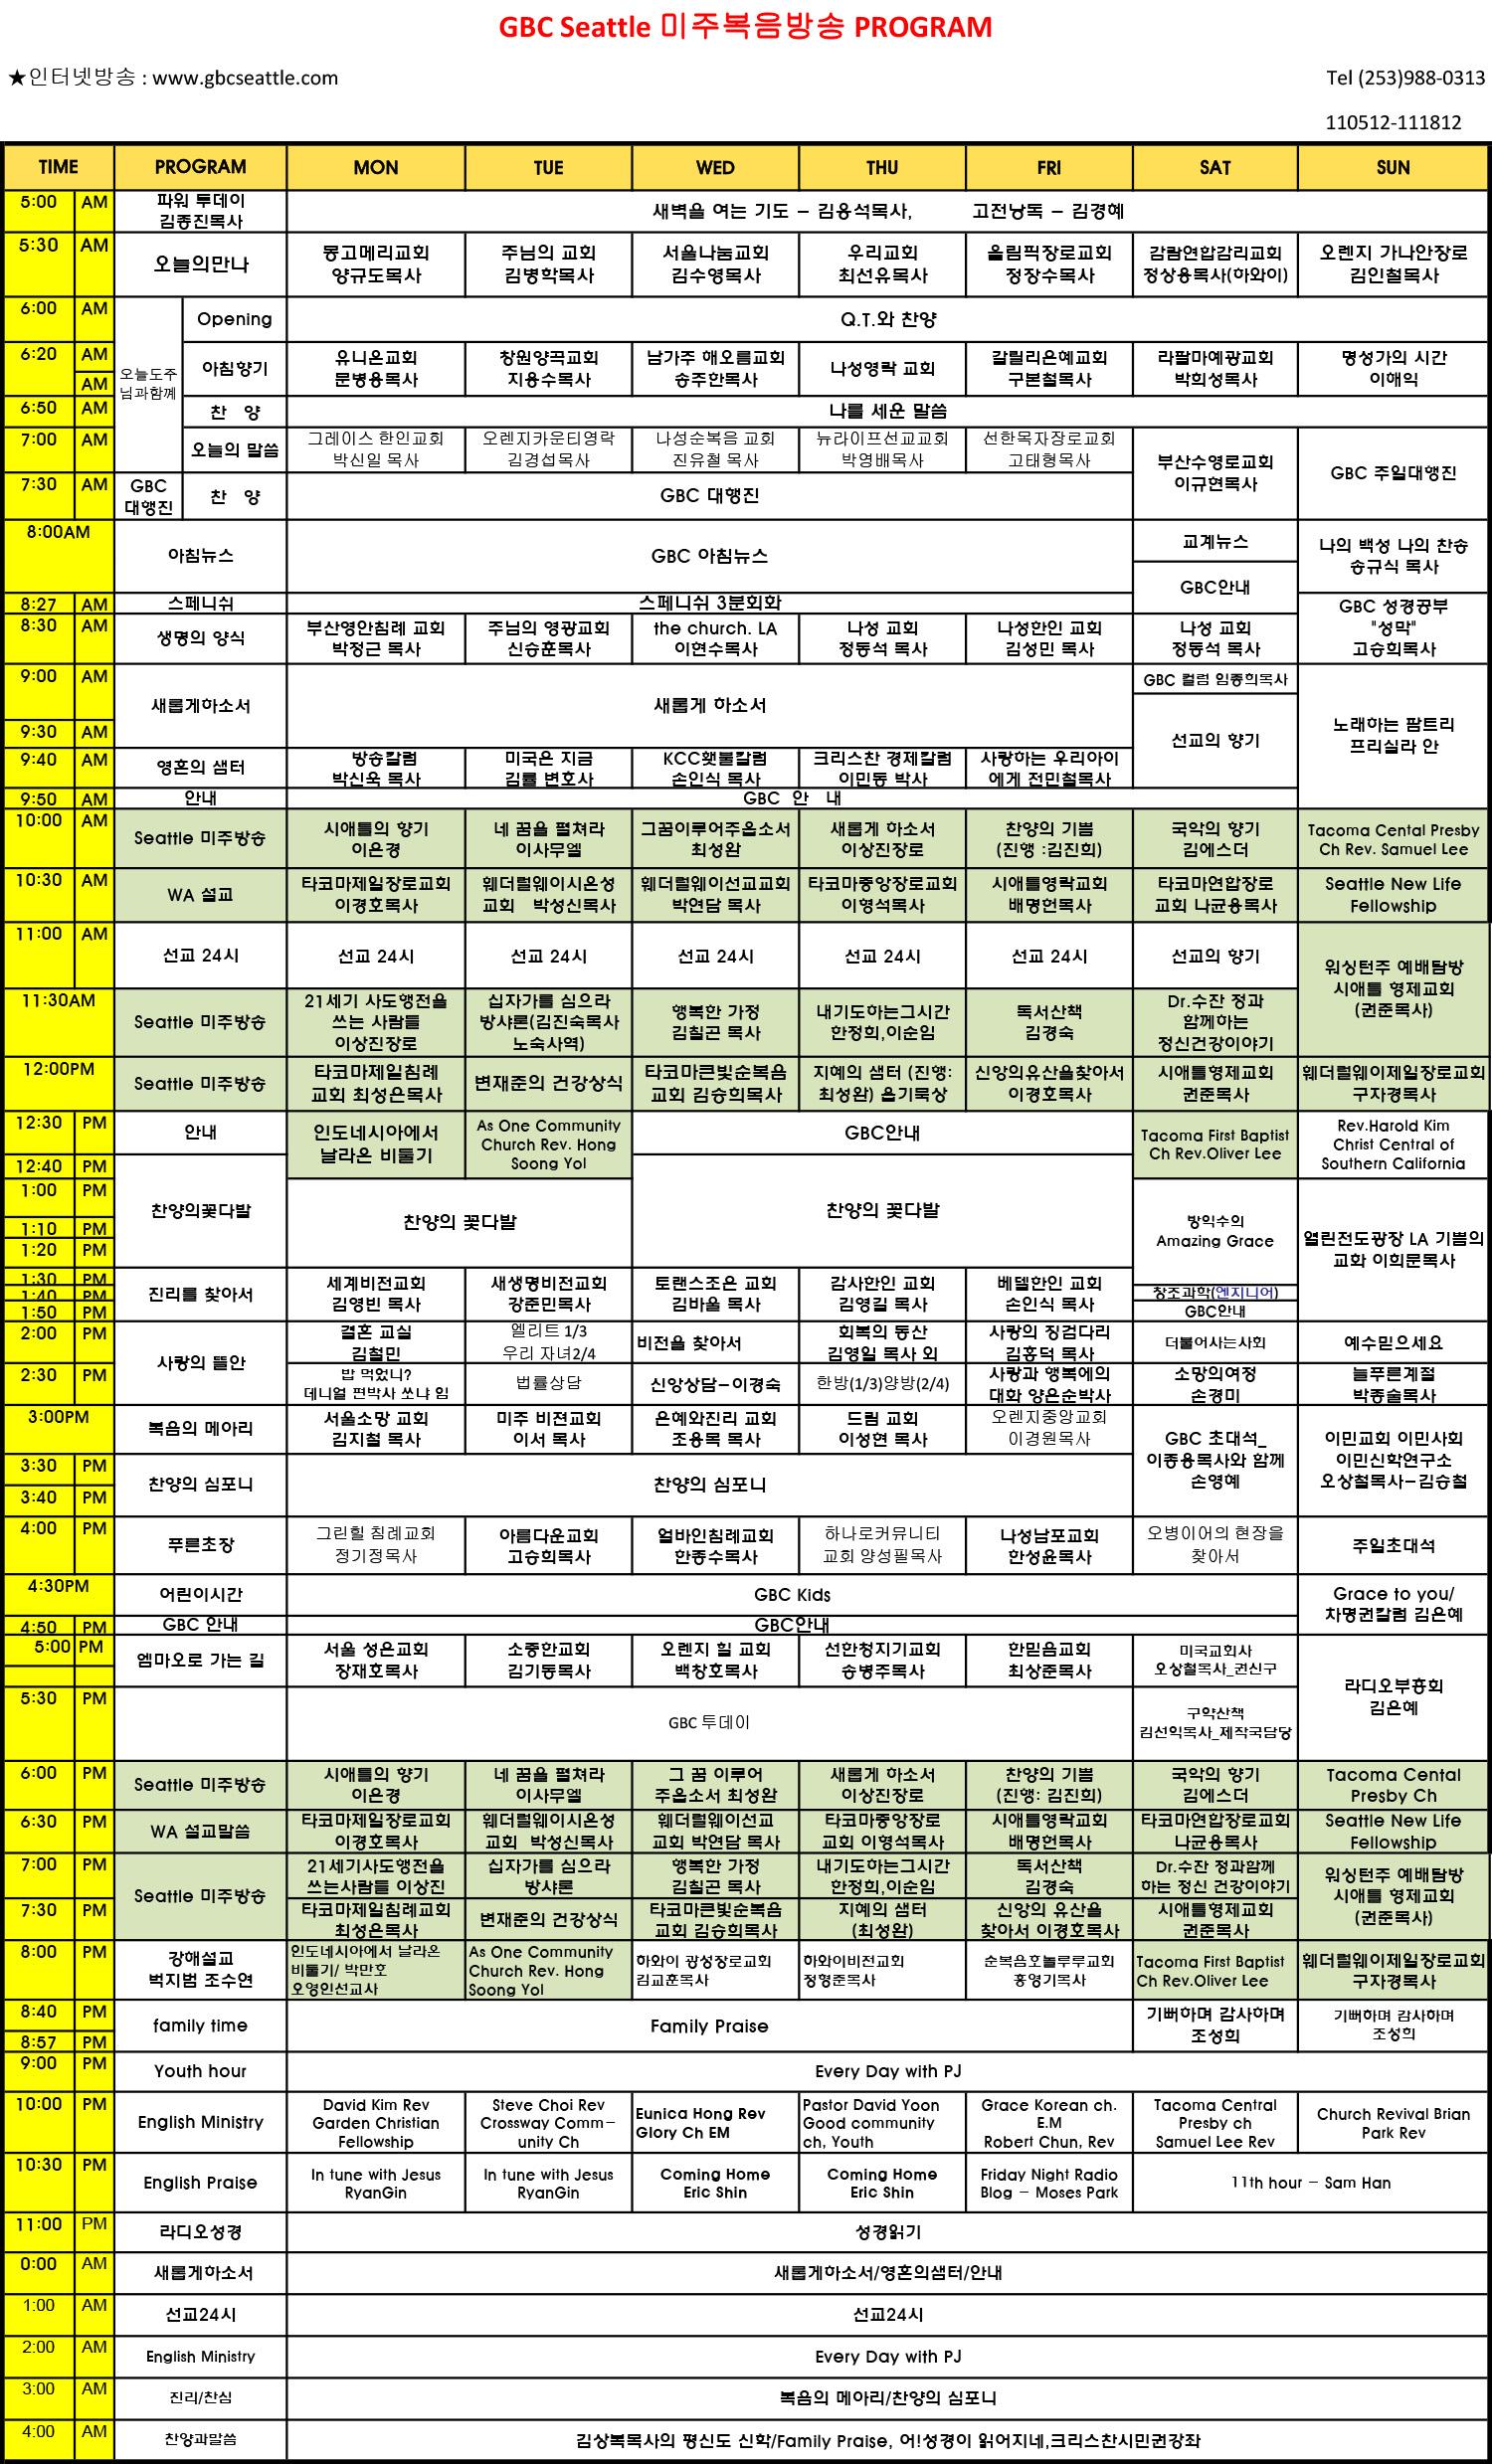 GBC Seattle 프로그램편성표_11월최종(110512-111812).jpg